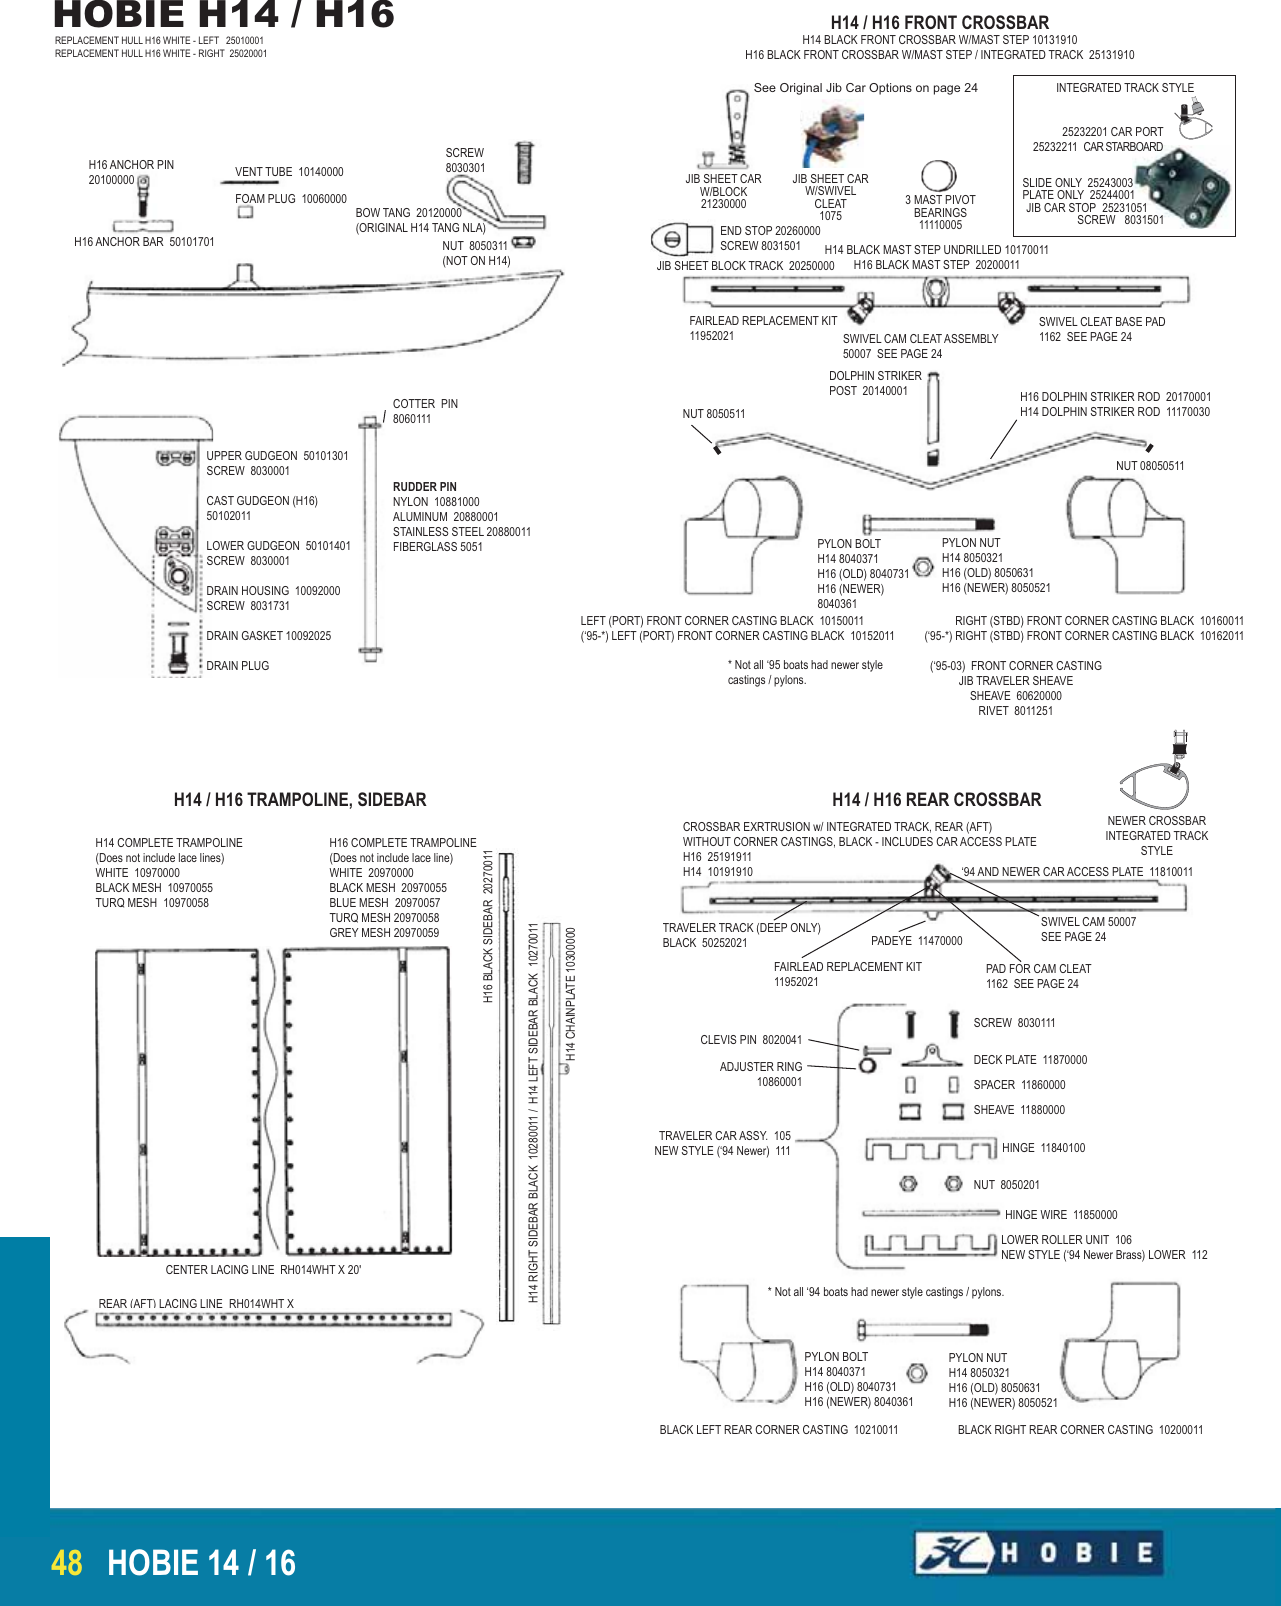 HOBIE 16 Jib Sheet Block Track//s Part # 20250000 Pair